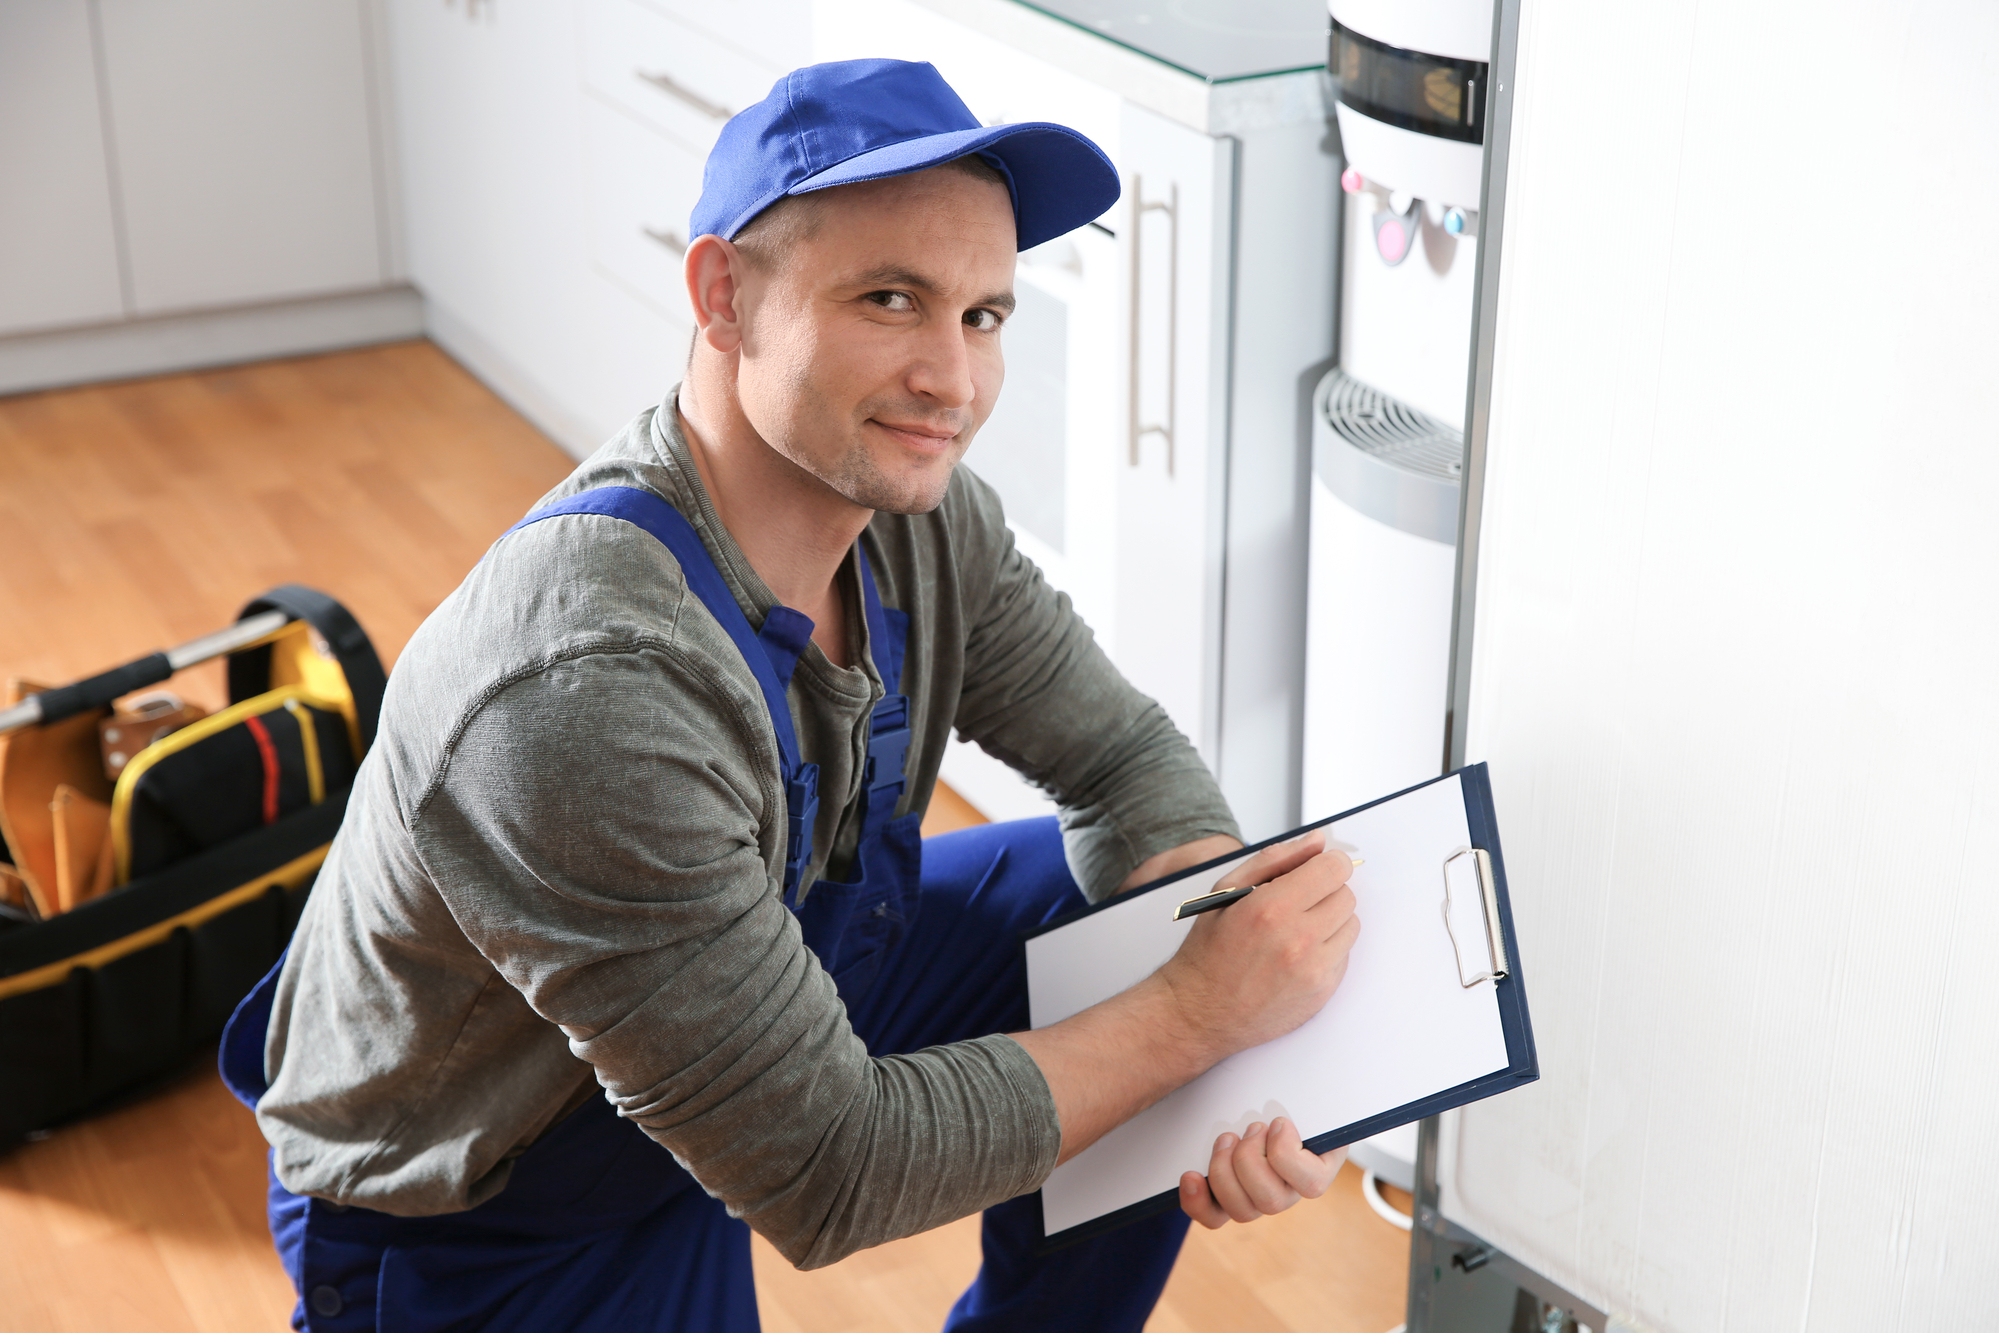 Male technician with clipboard examining broken refrigerator in kitchen